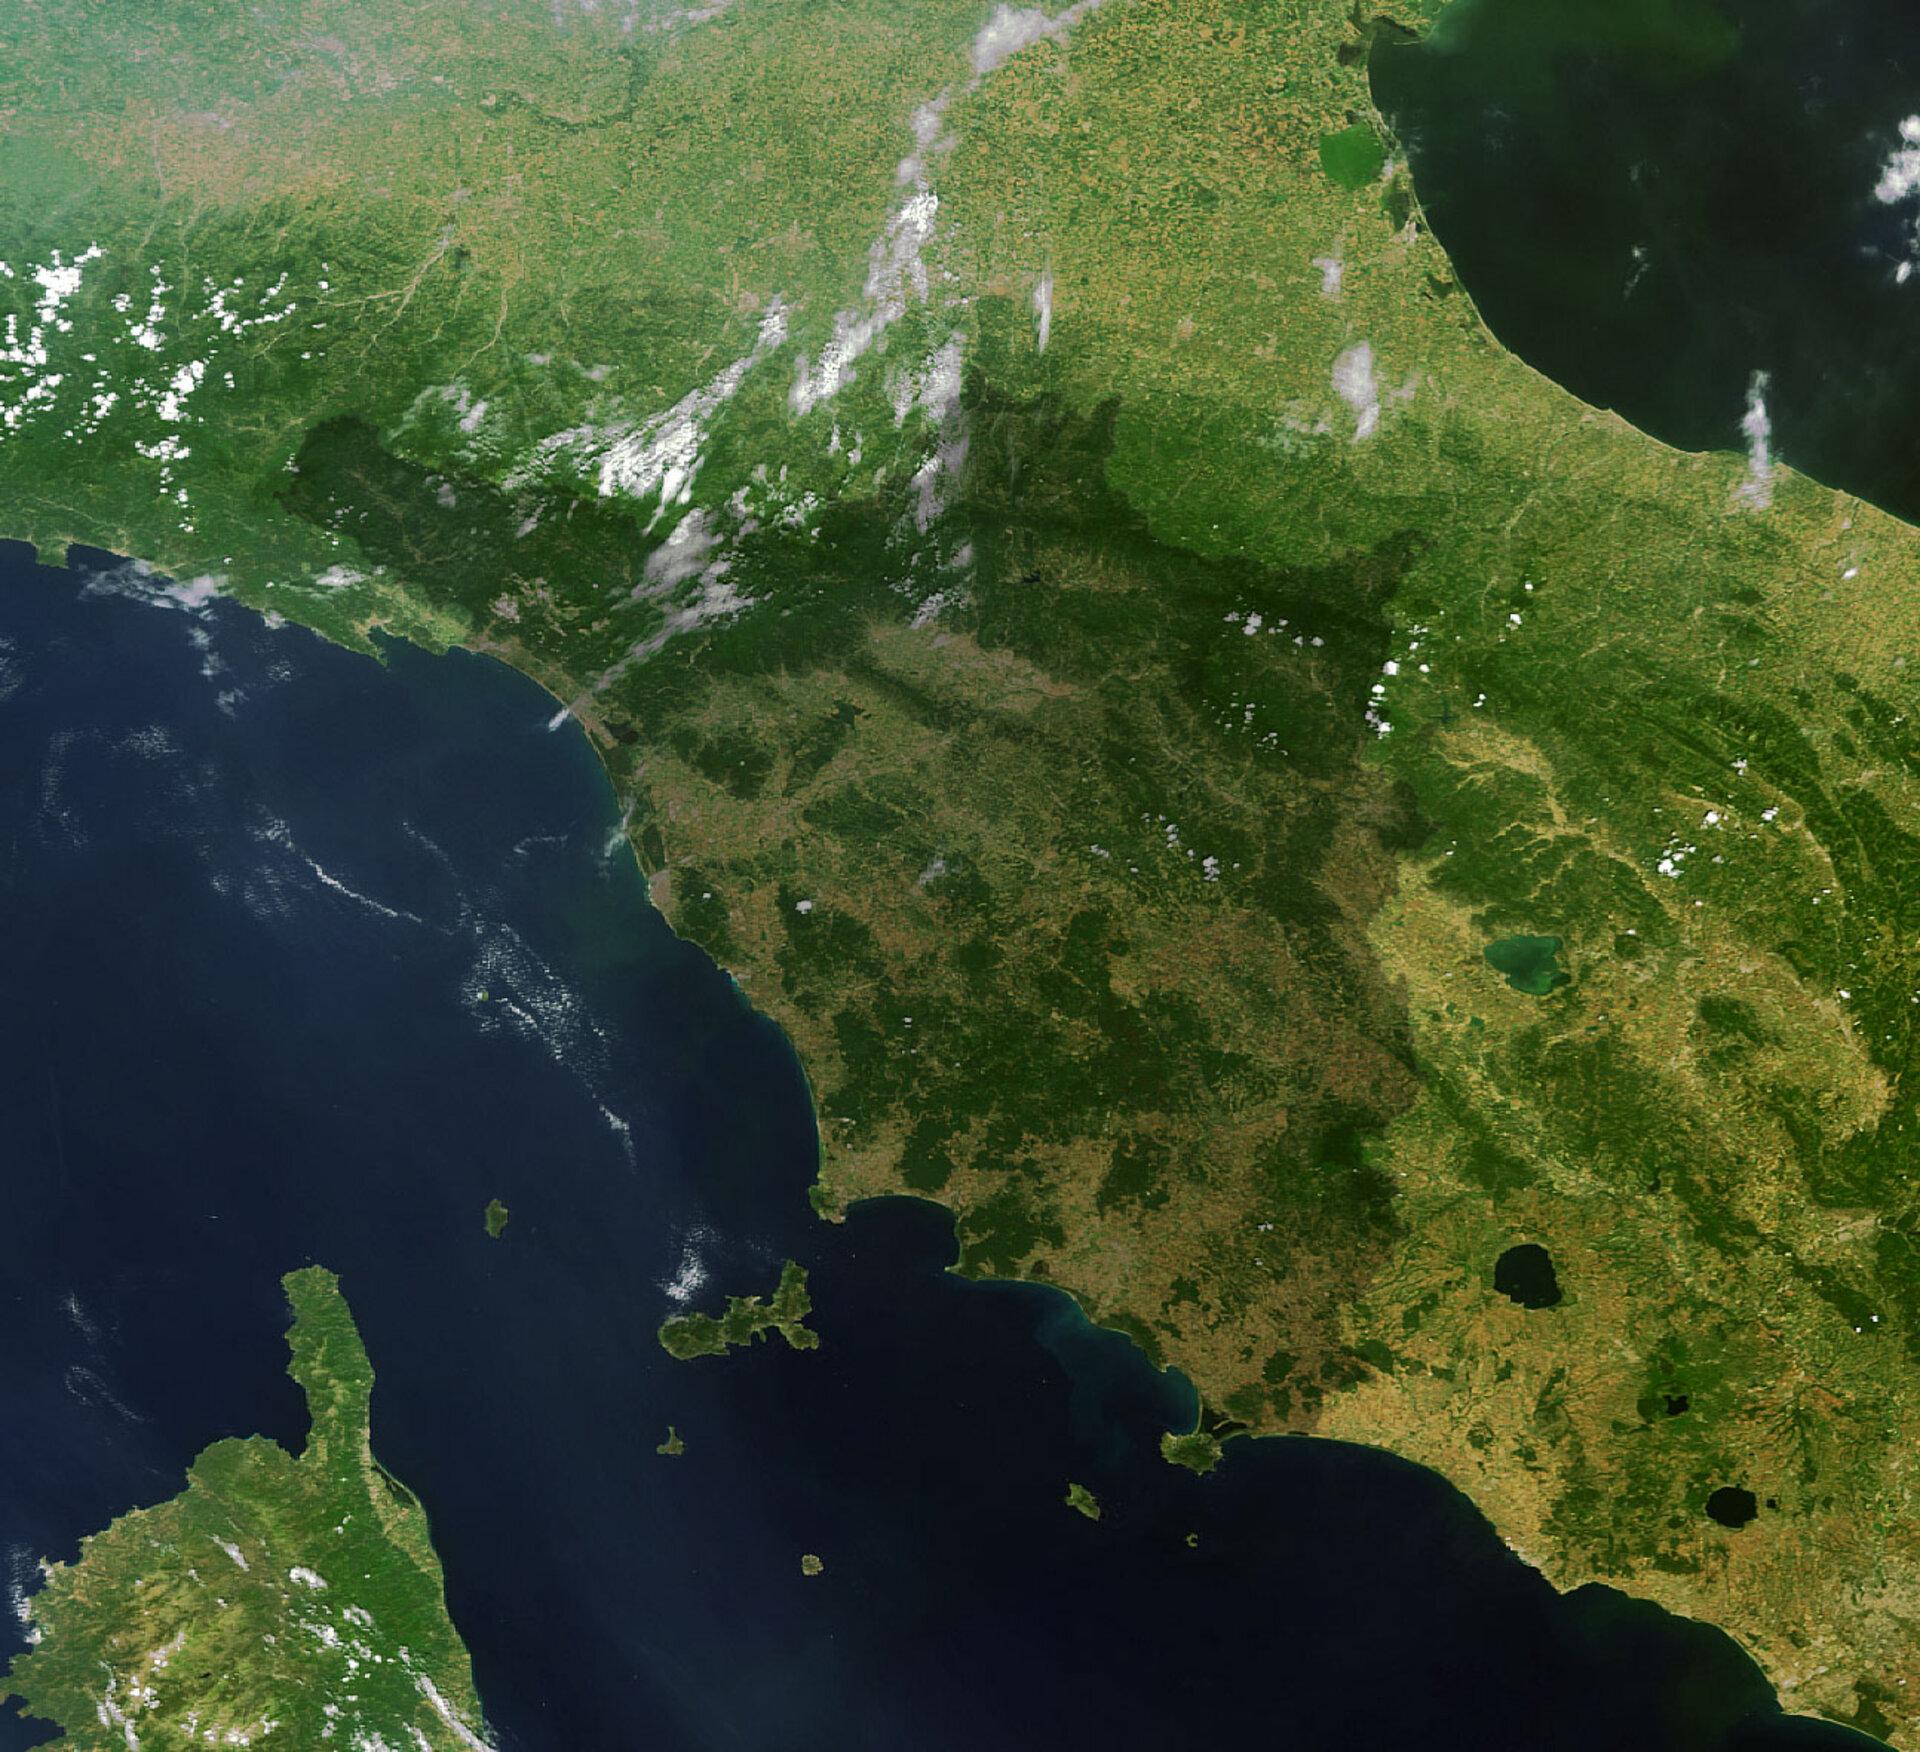 Costa Tirrenica Toscana Cartina.Esa Uno Sguardo Dall Alto Sulla Toscana